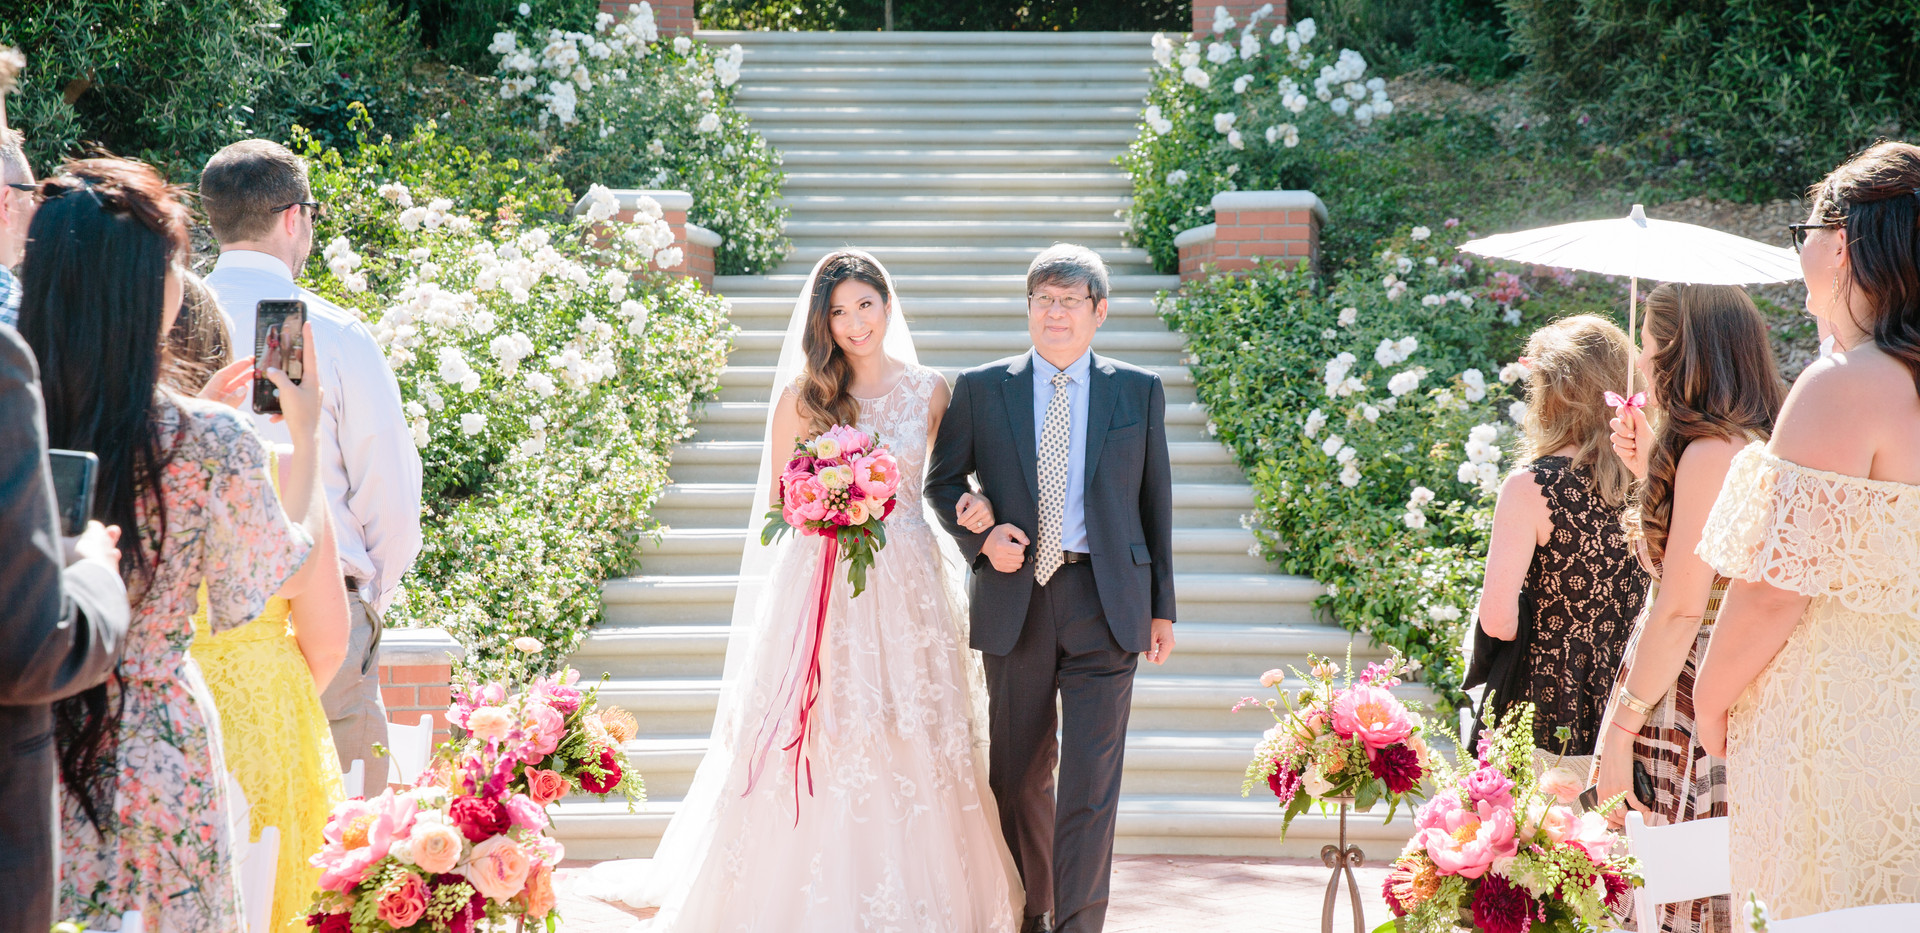 Rustic Quail Ranch Wedding Ceremony